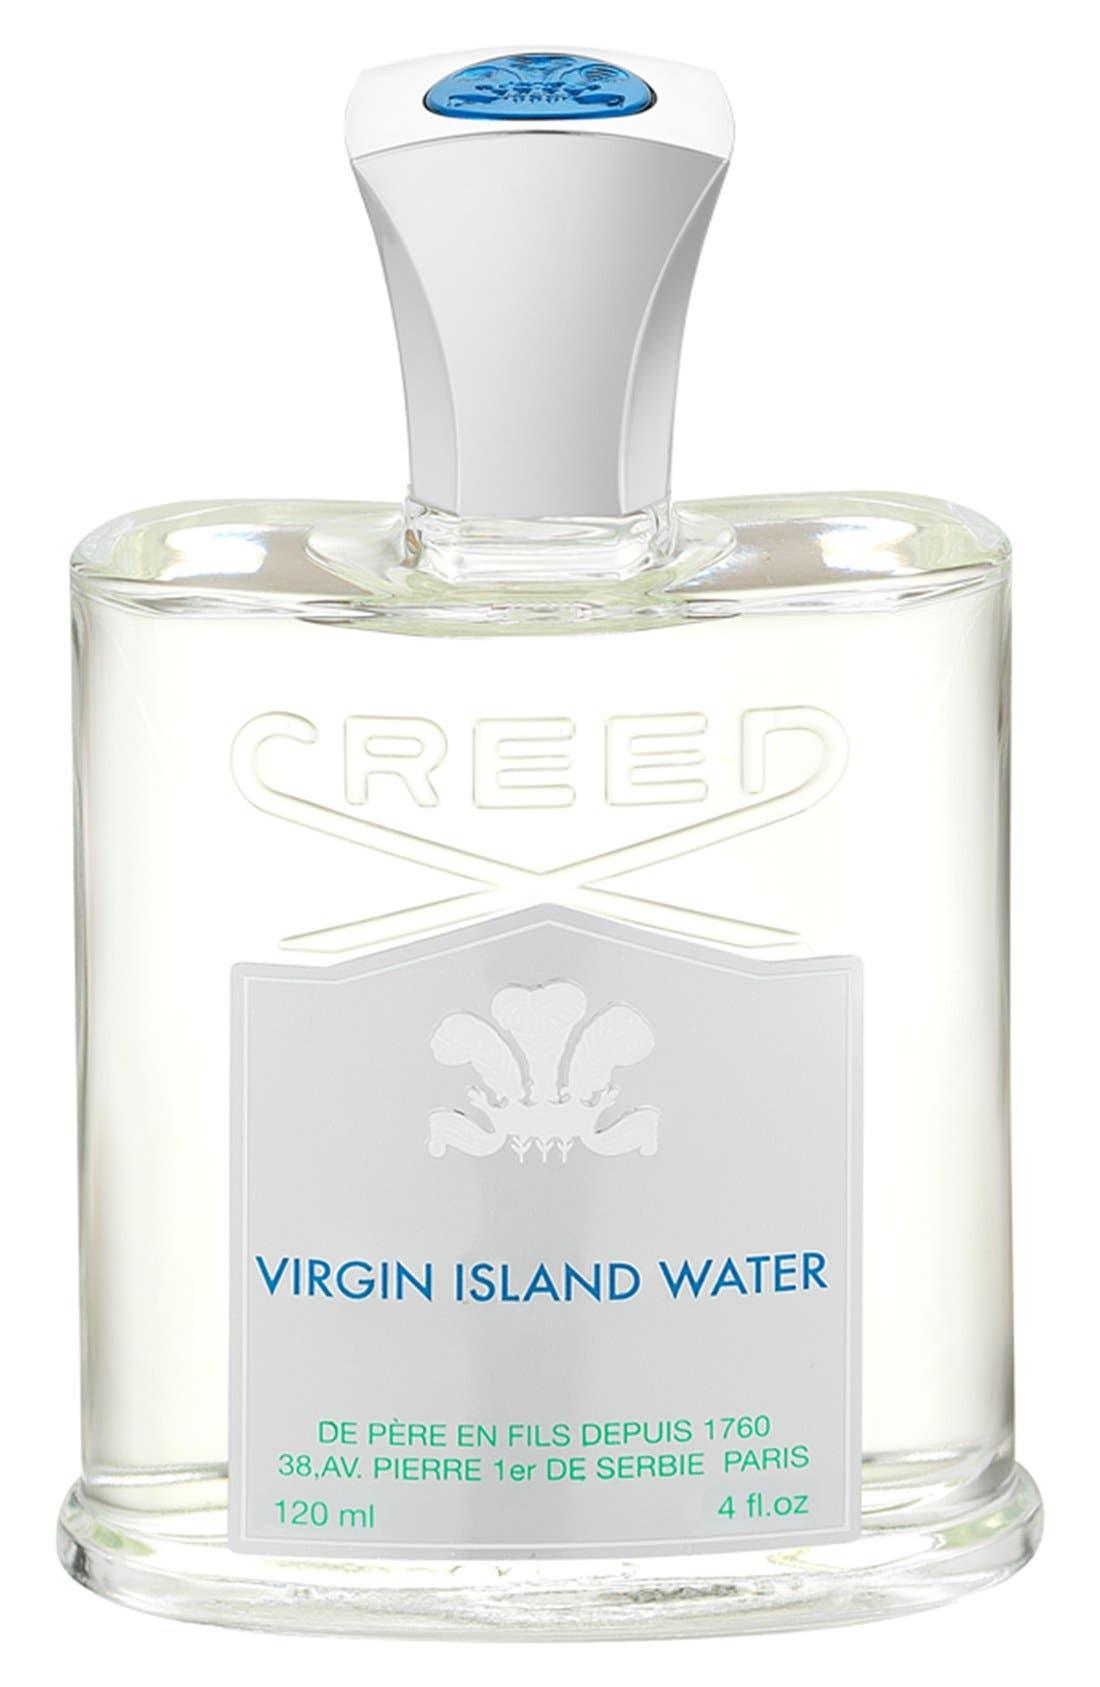 Creed 'Virgin Island Water' Fragrance